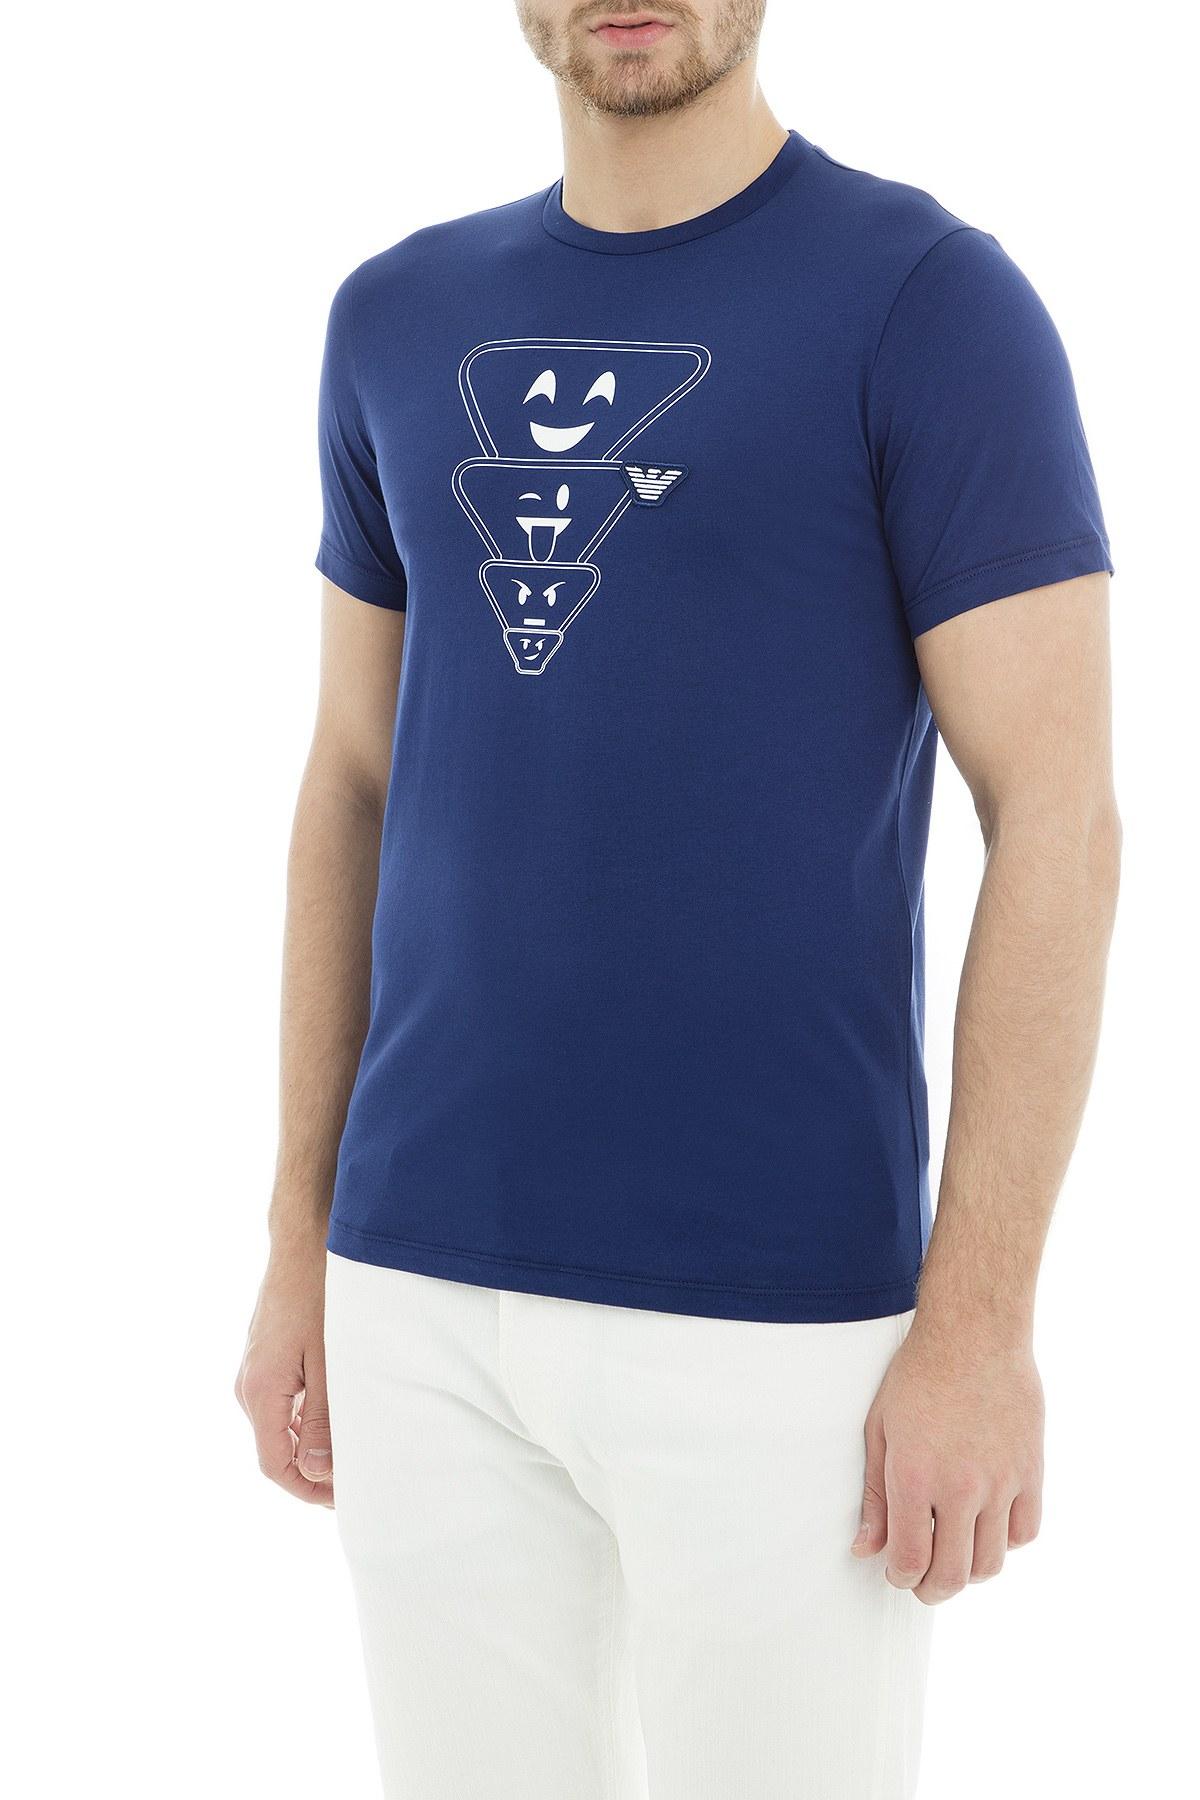 Emporio Armani Erkek T Shirt 6Z1TS2 1JQUZ 0934 SAKS